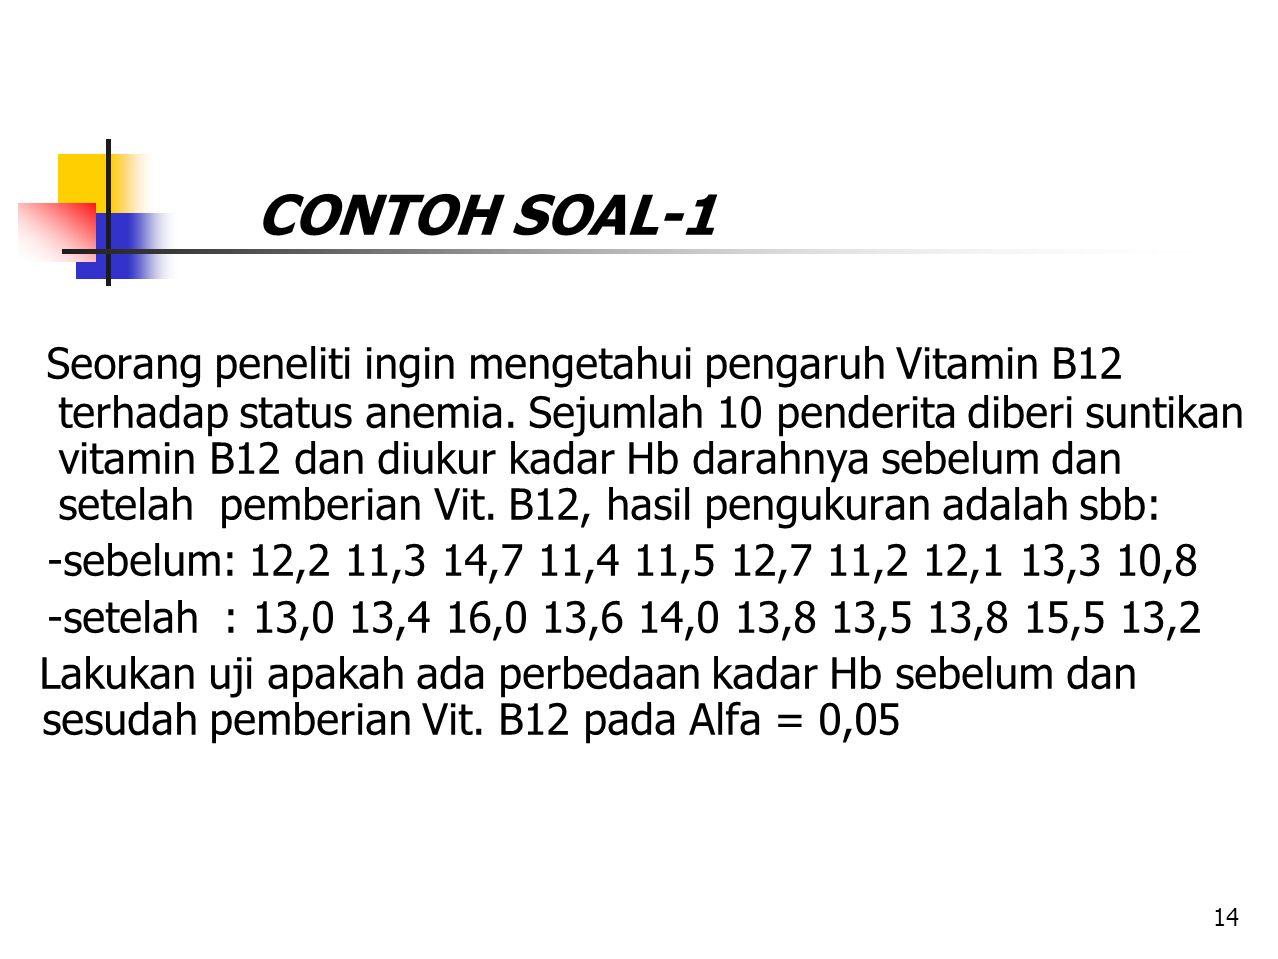 CONTOH SOAL-1 Seorang peneliti ingin mengetahui pengaruh Vitamin B12 terhadap status anemia. Sejumlah 10 penderita diberi suntikan vitamin B12 dan diu